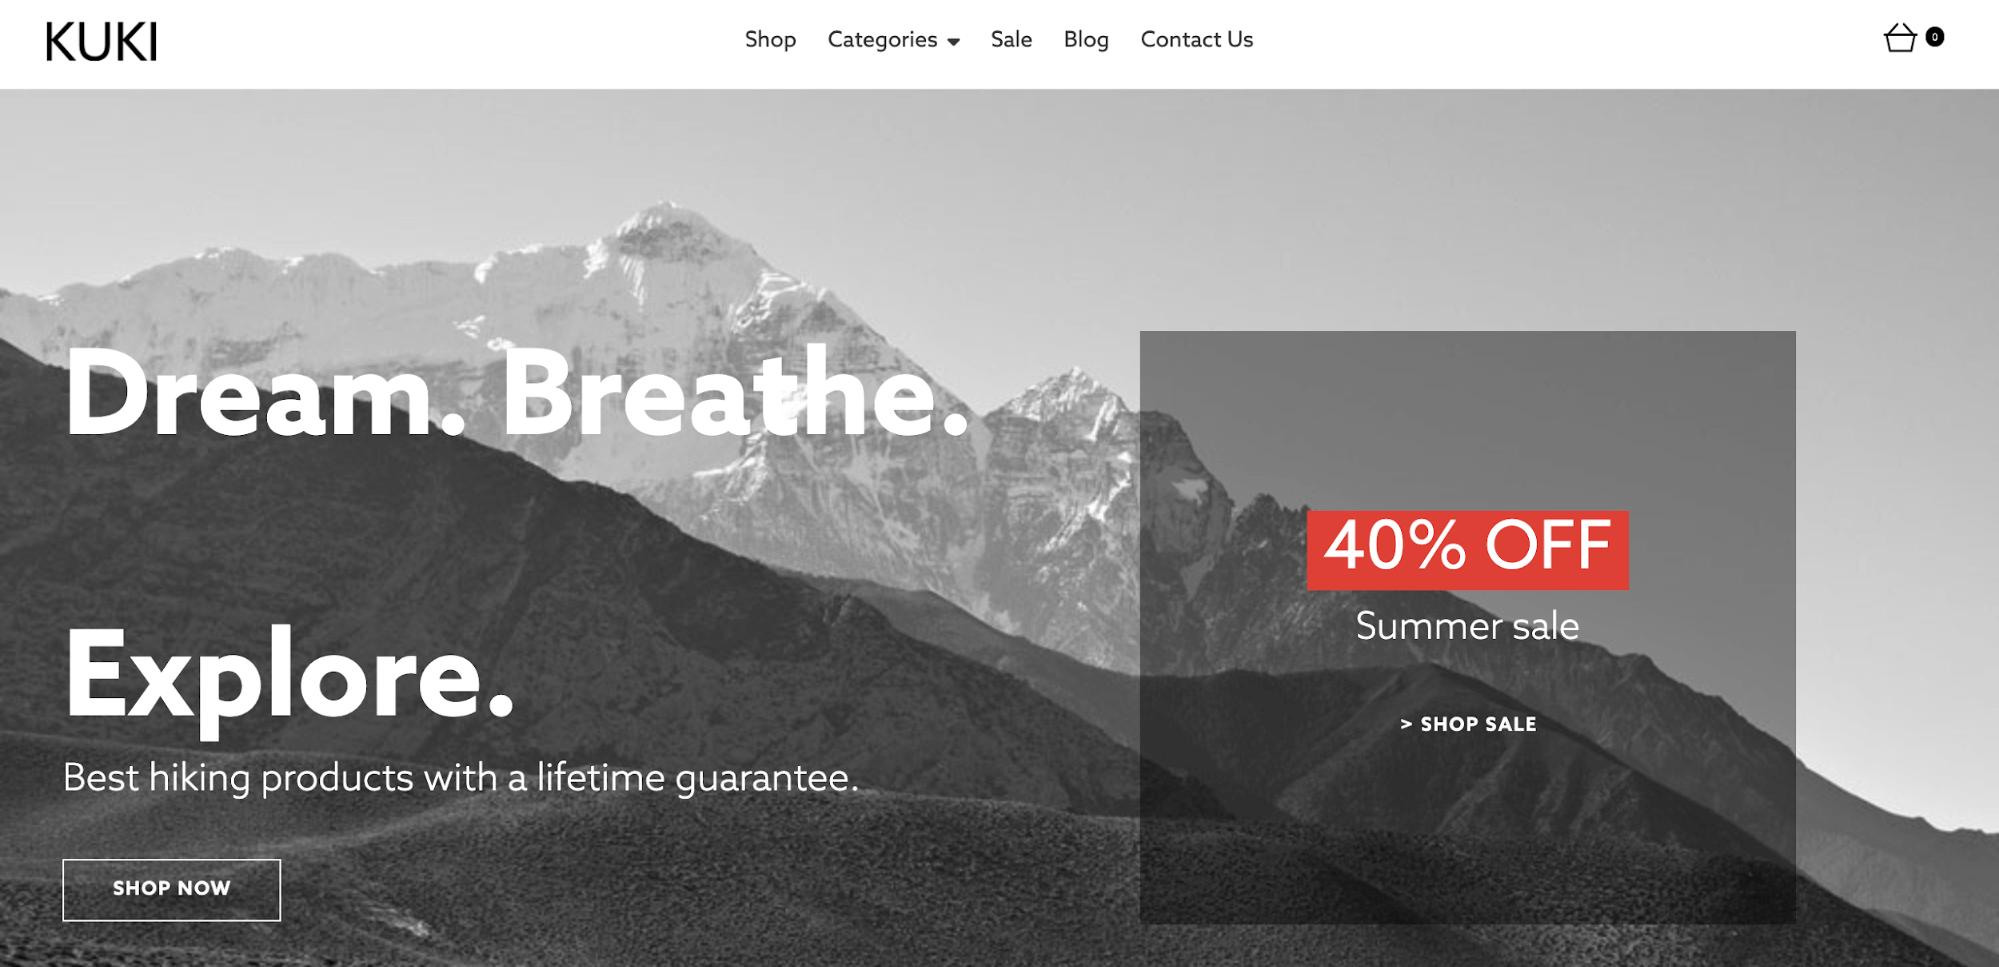 Увеличение конверсии сайта интернет-магазина